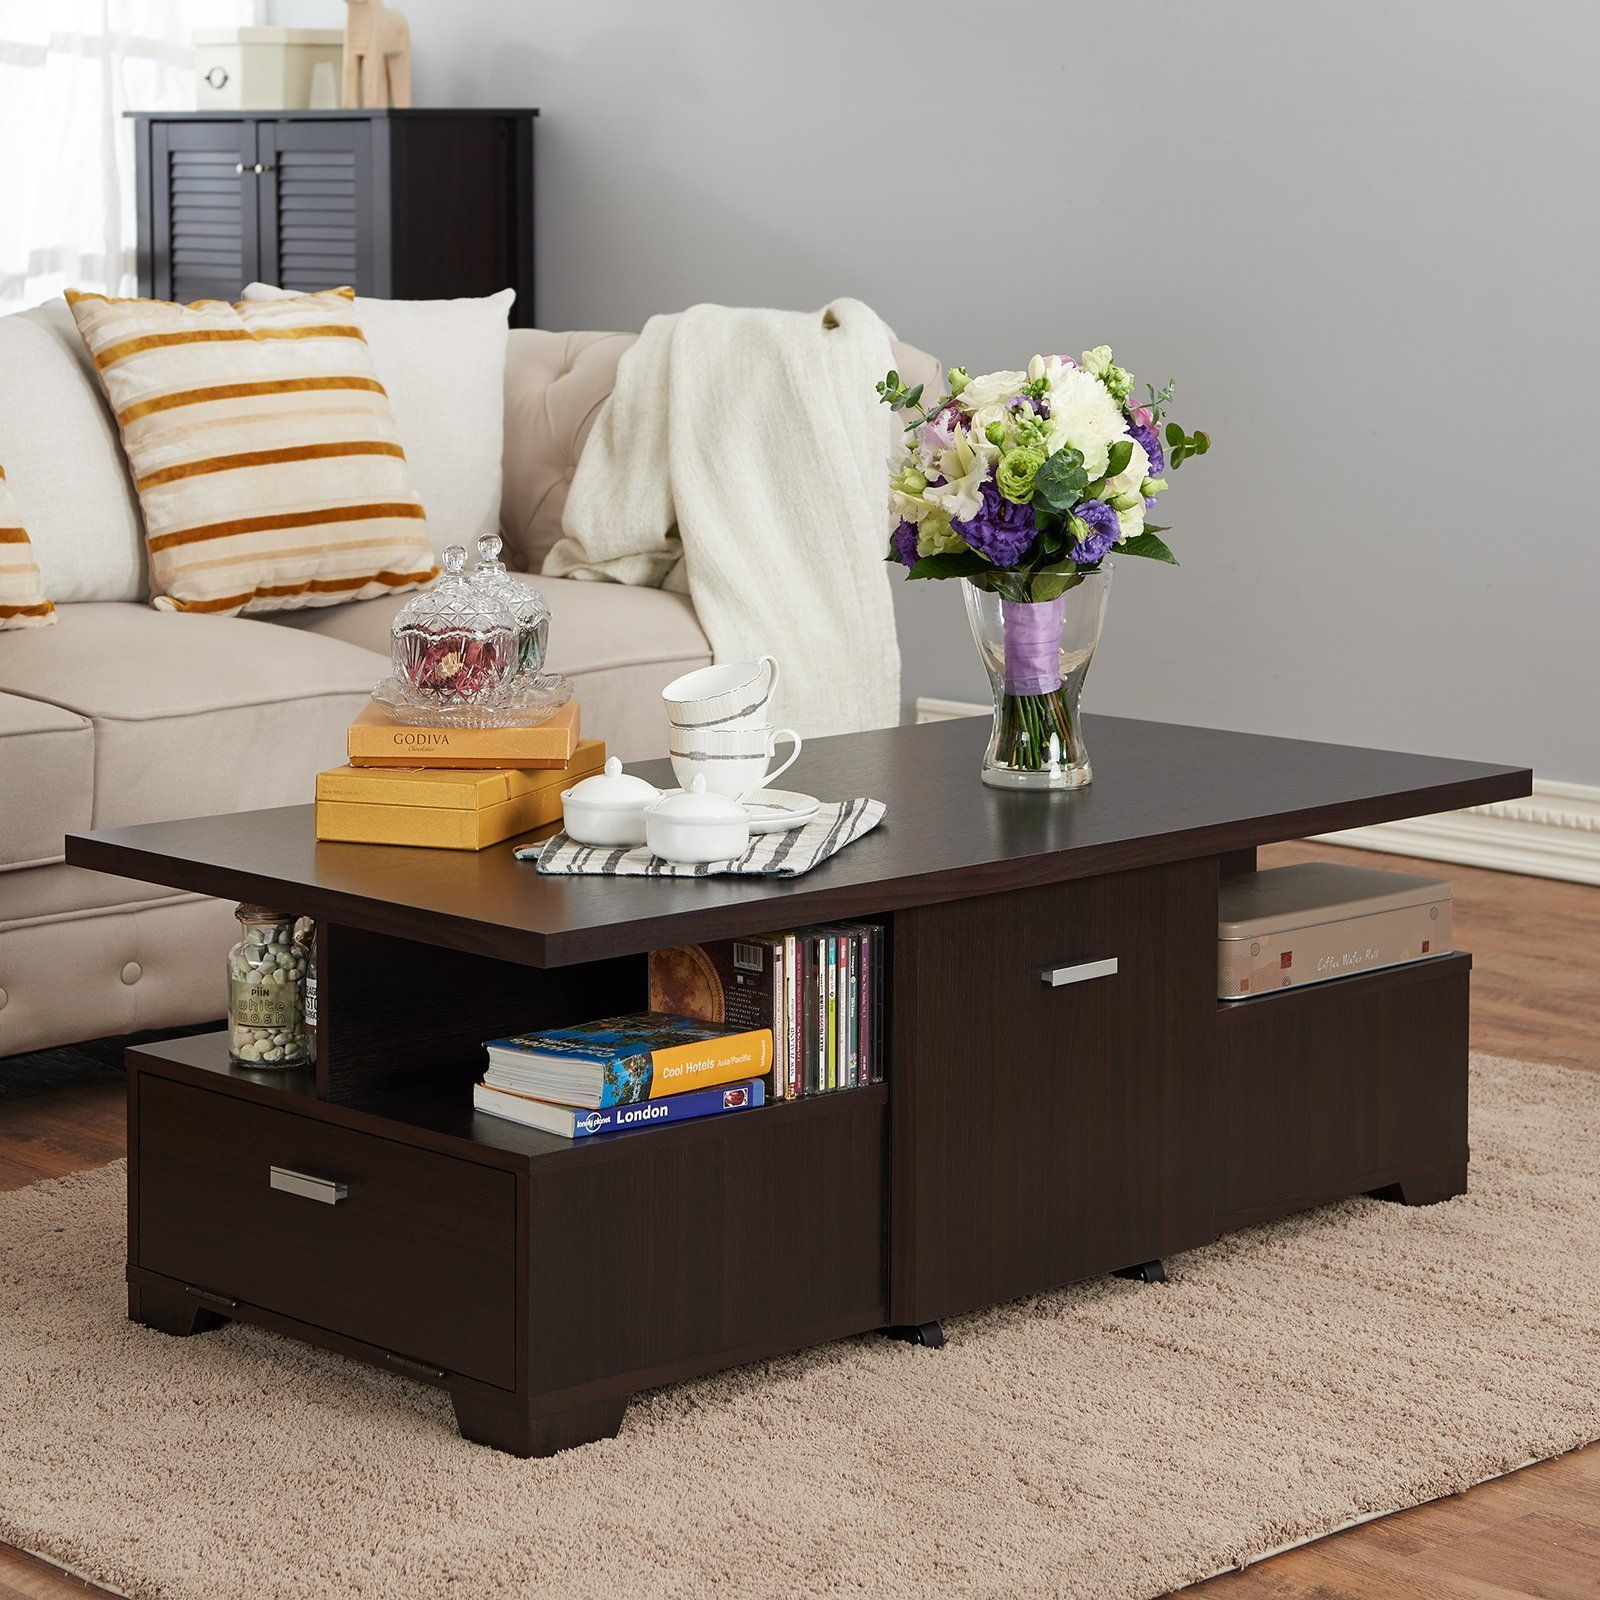 Furniture of America Portena Removable Center Storage Coffee Table